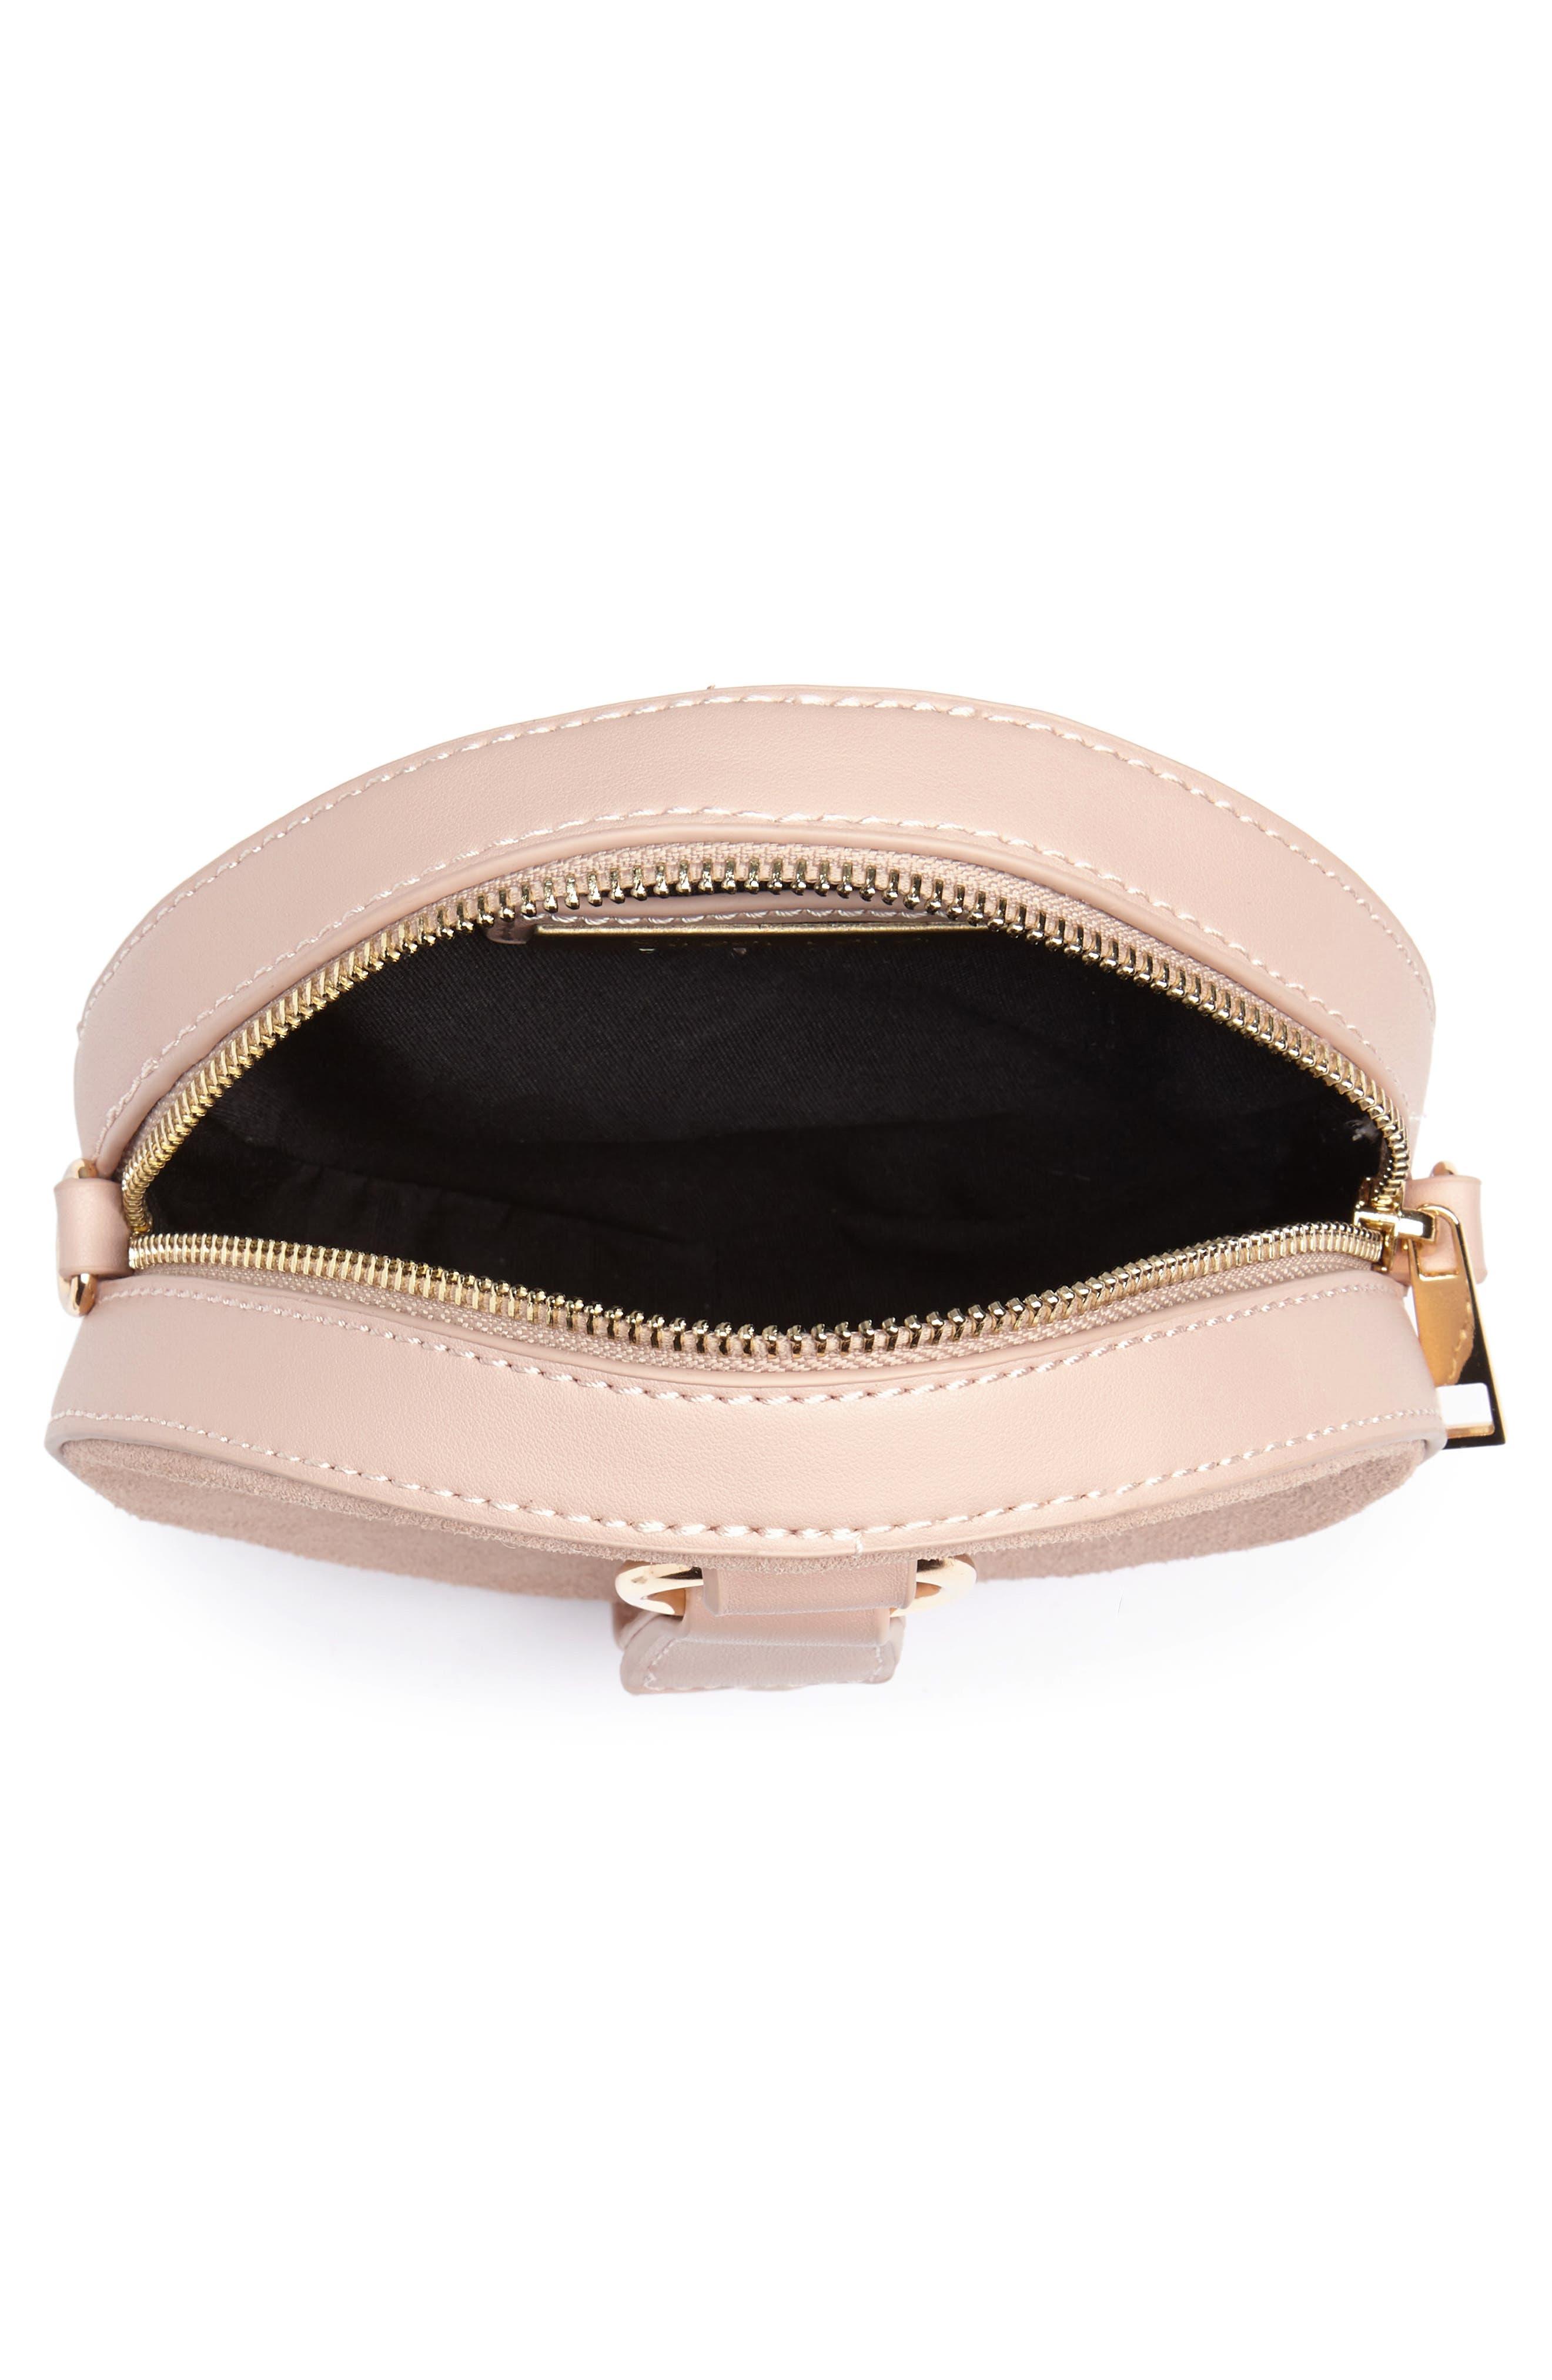 Circle Bag with Wristlet,                             Alternate thumbnail 4, color,                             250